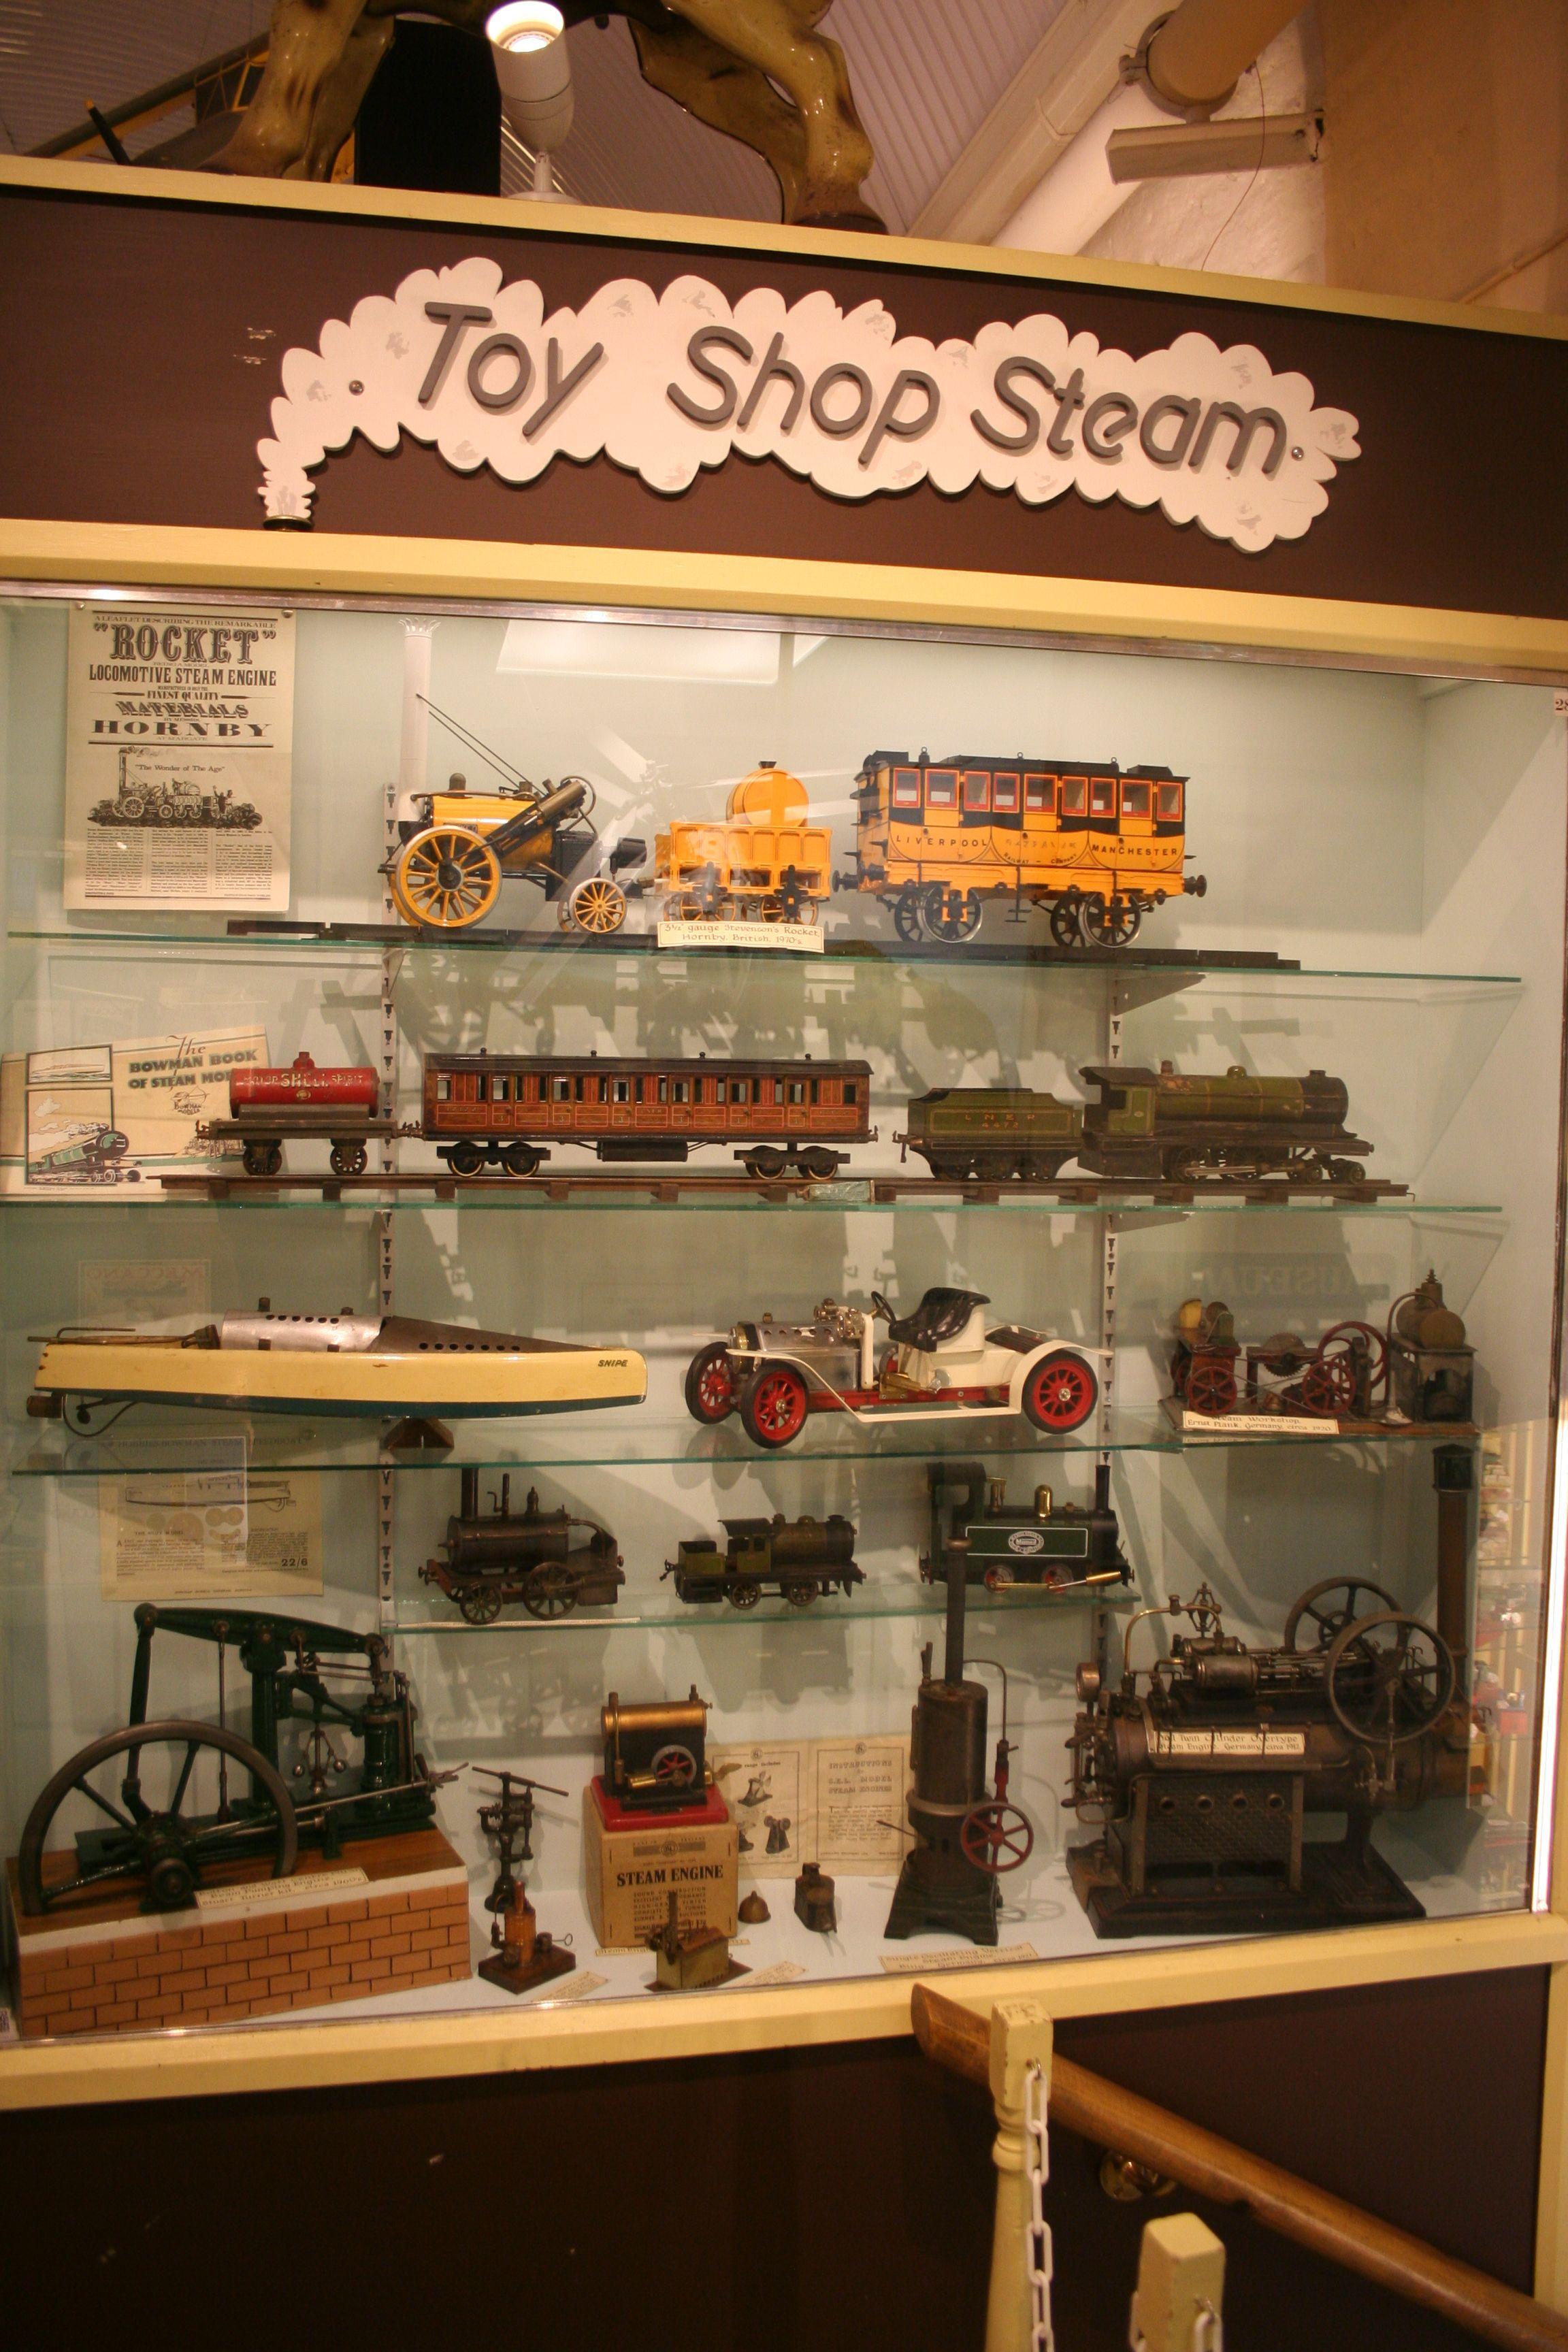 Toy Shop Steam Toys shop, Toy train, Decor